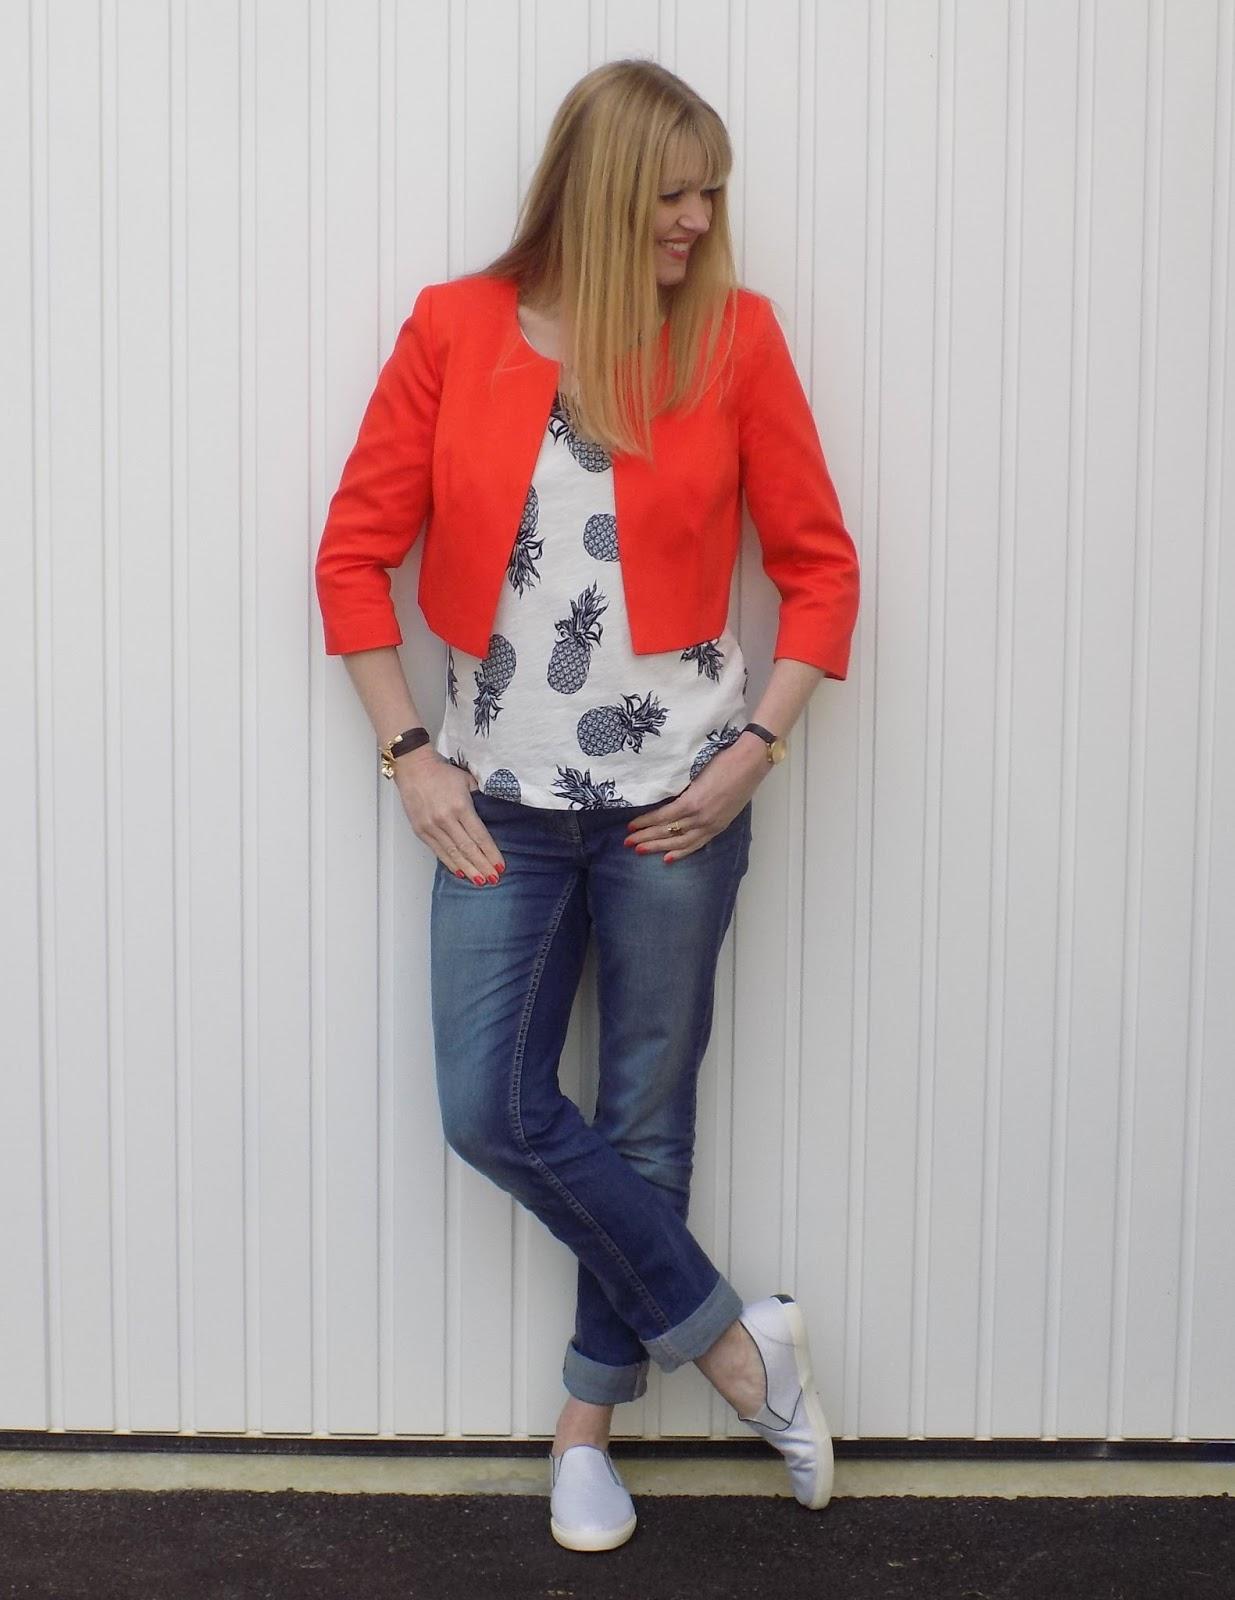 Pineapple top and boyfriend jeans with orange jacket. Redhead wearing orange